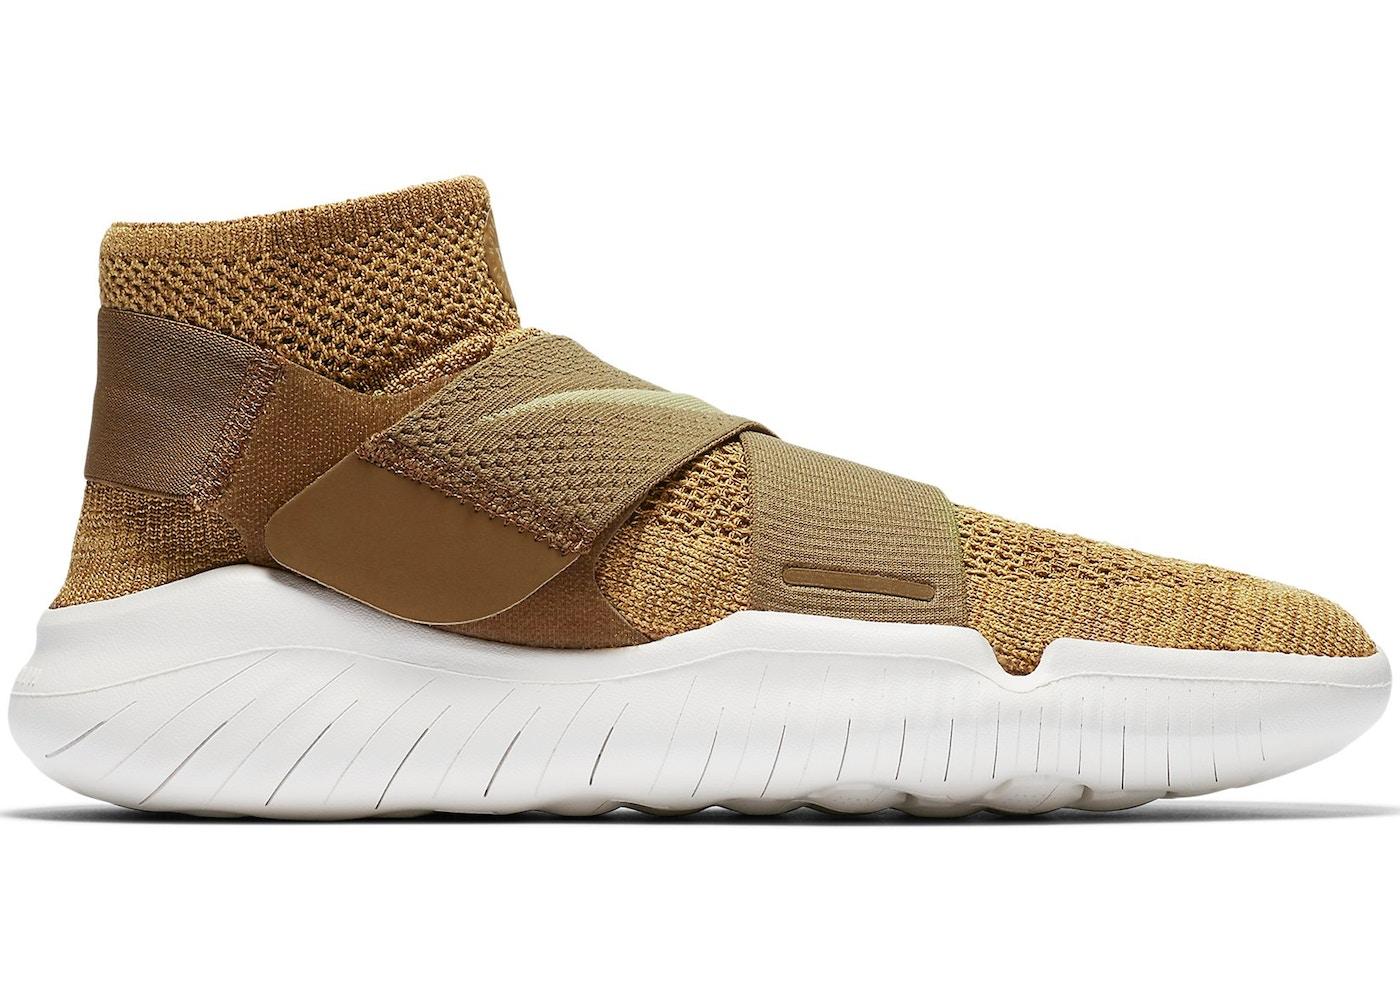 matiz Constitución República  Nike Free RN Motion Flyknit 2018 Golden Beige - 942840-201